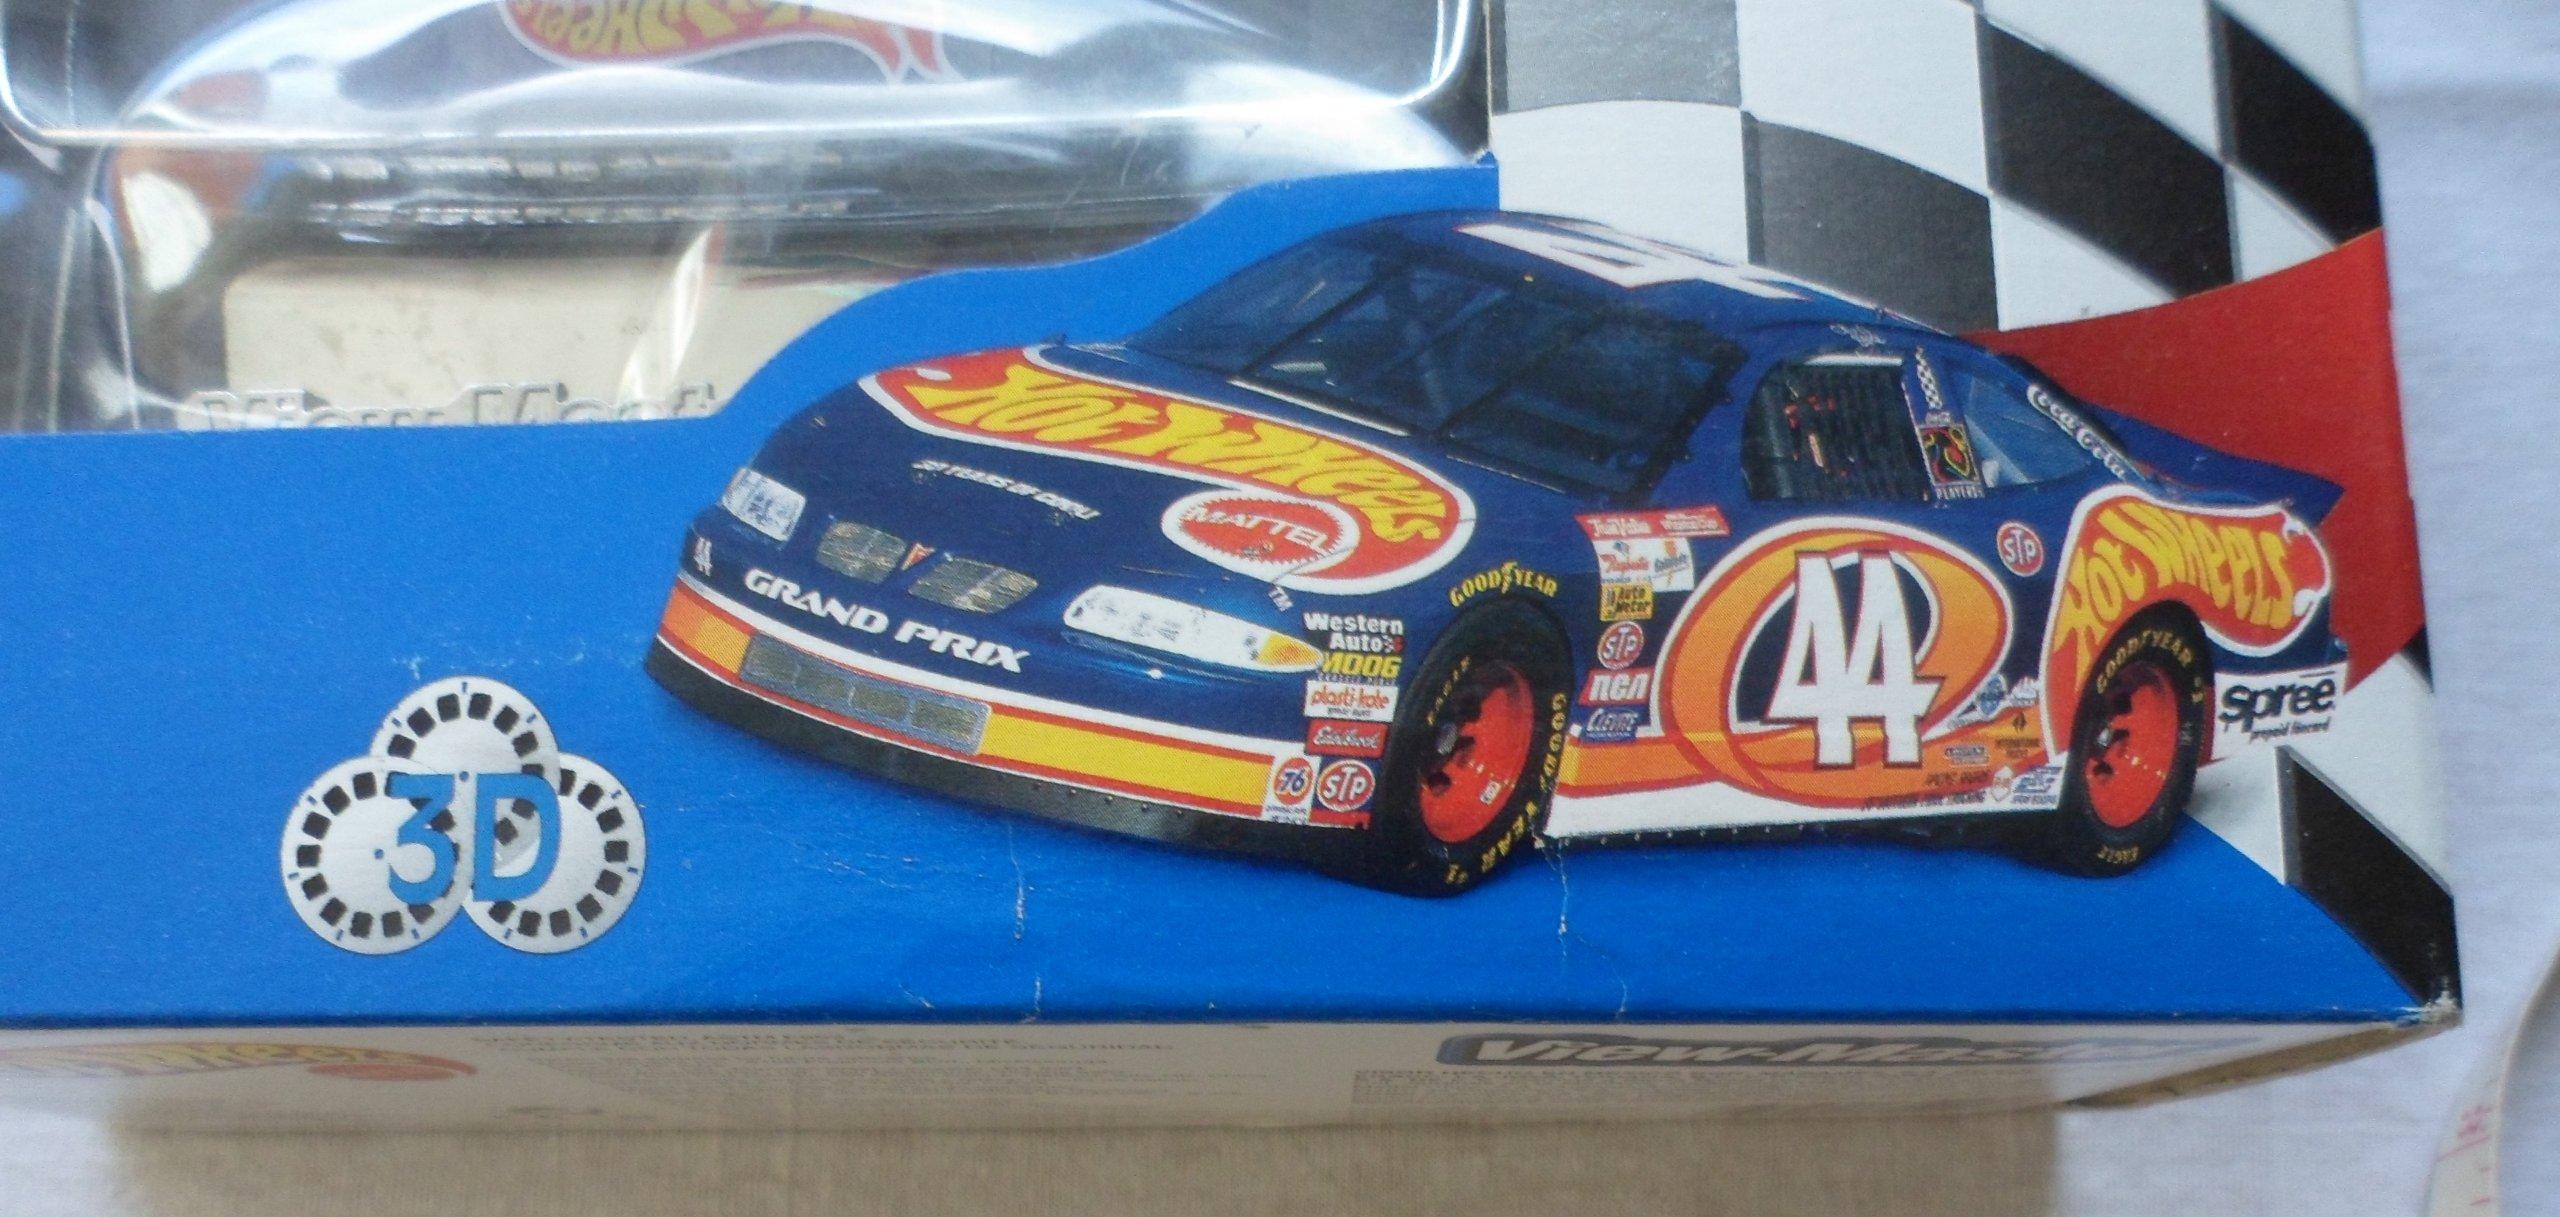 HOT WHEELS Racing Kyle Petty View Master Mattel by Hot Wheels (Image #3)